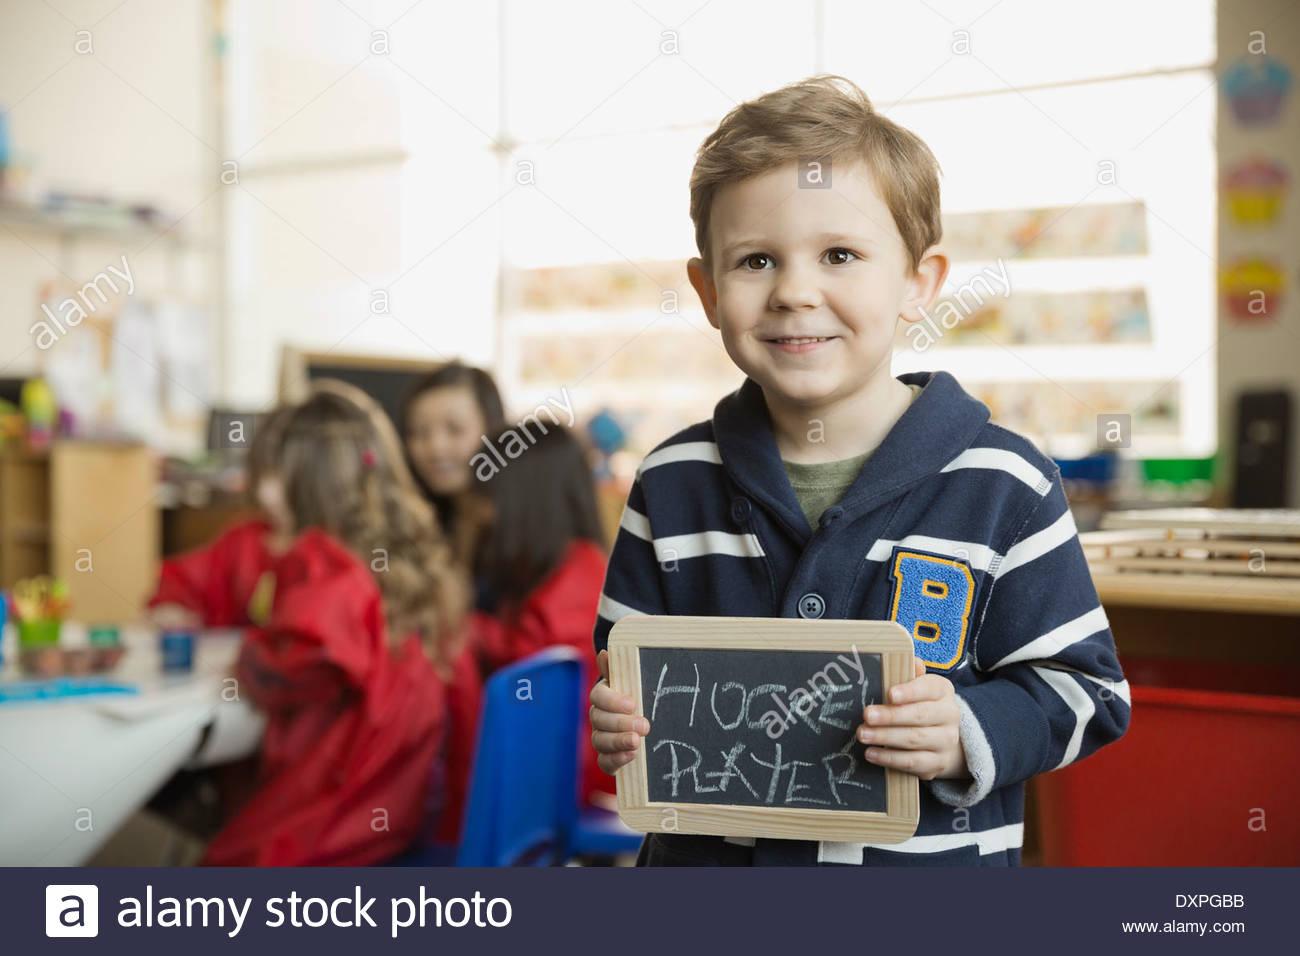 Elementary boy holding ardoise avec 'Hockey Player' écrit dessus Photo Stock